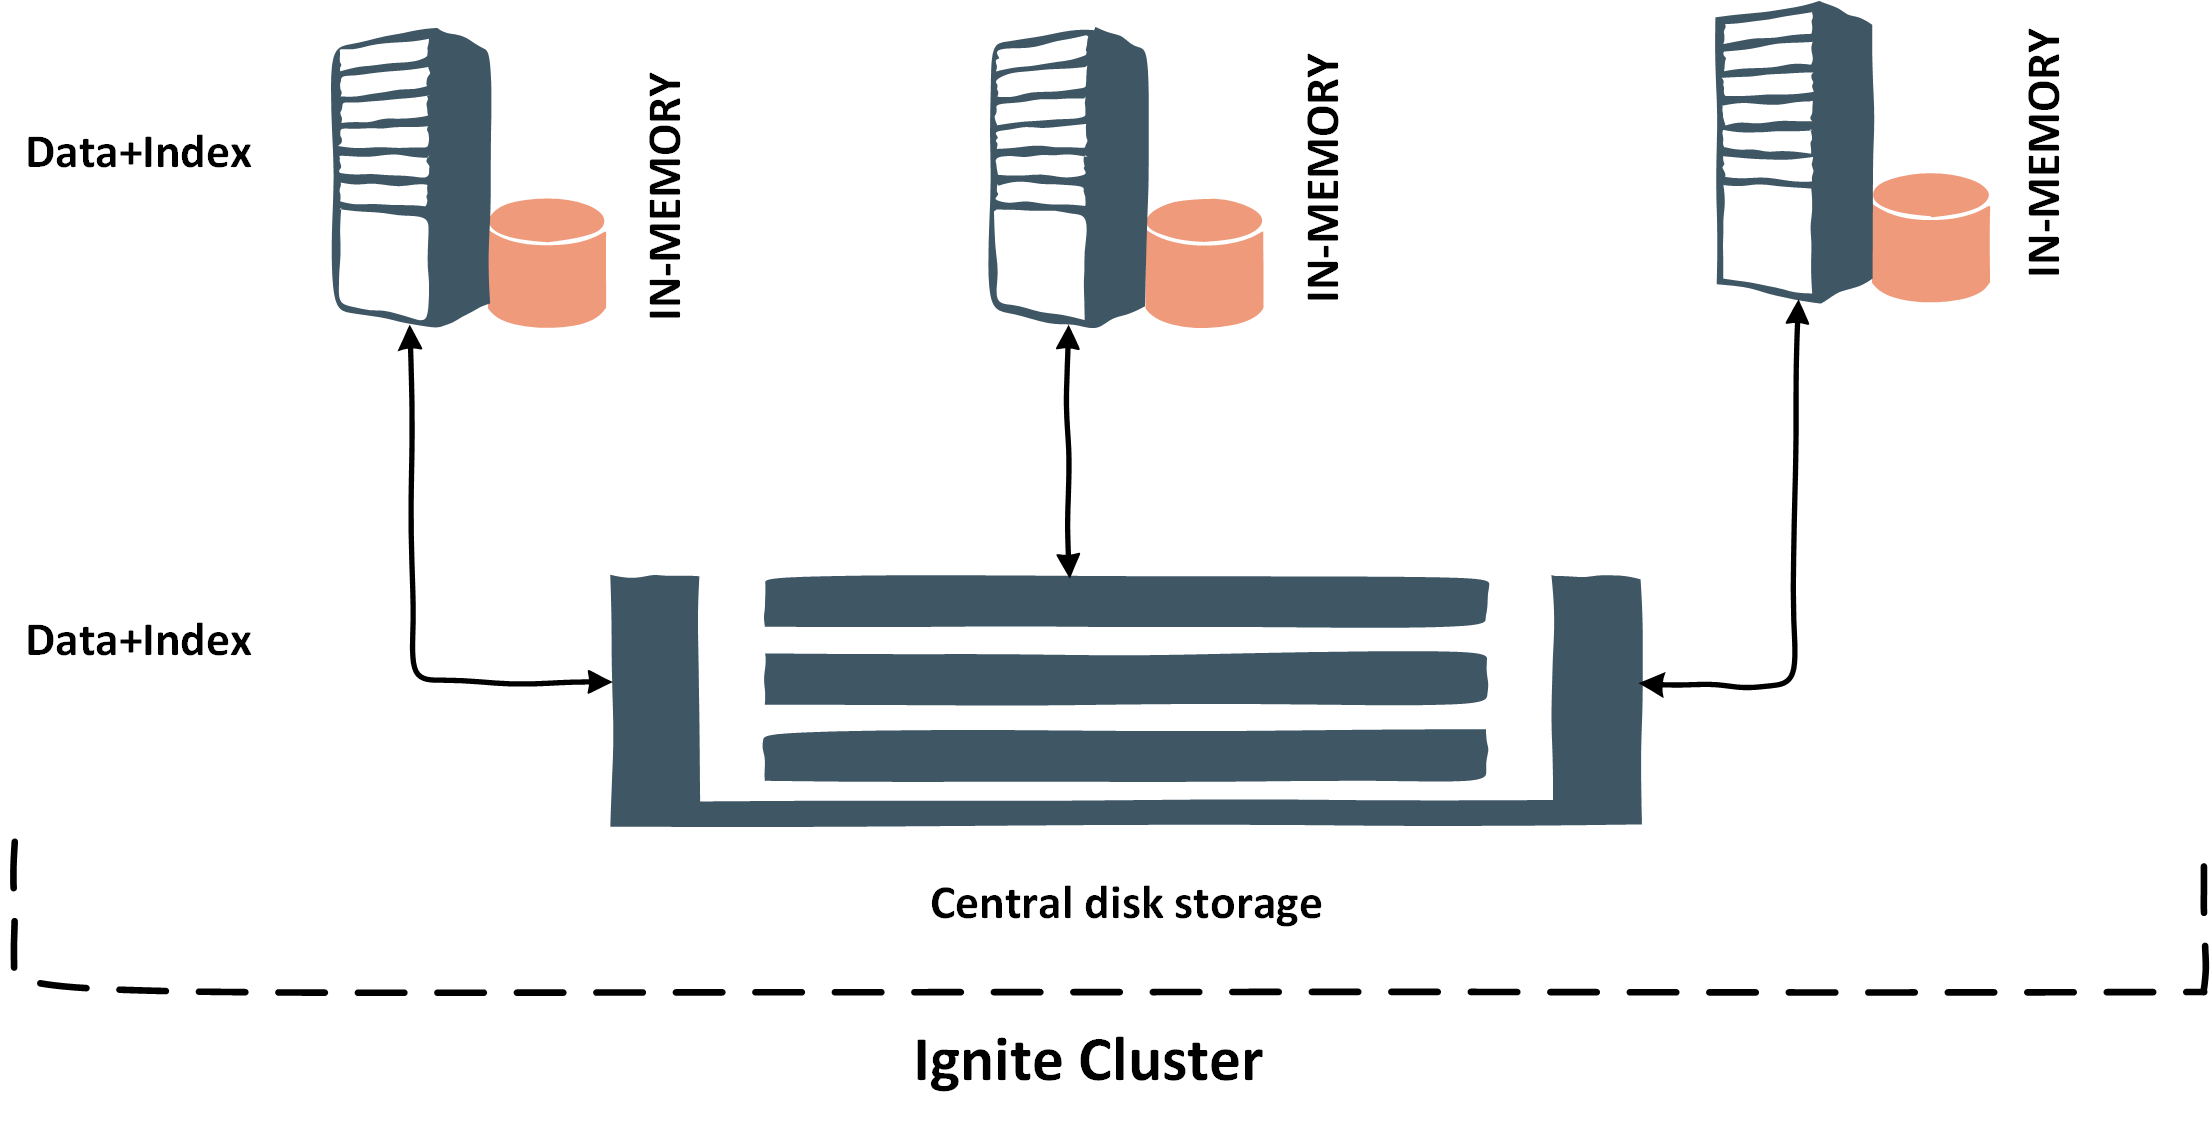 Central disk storage